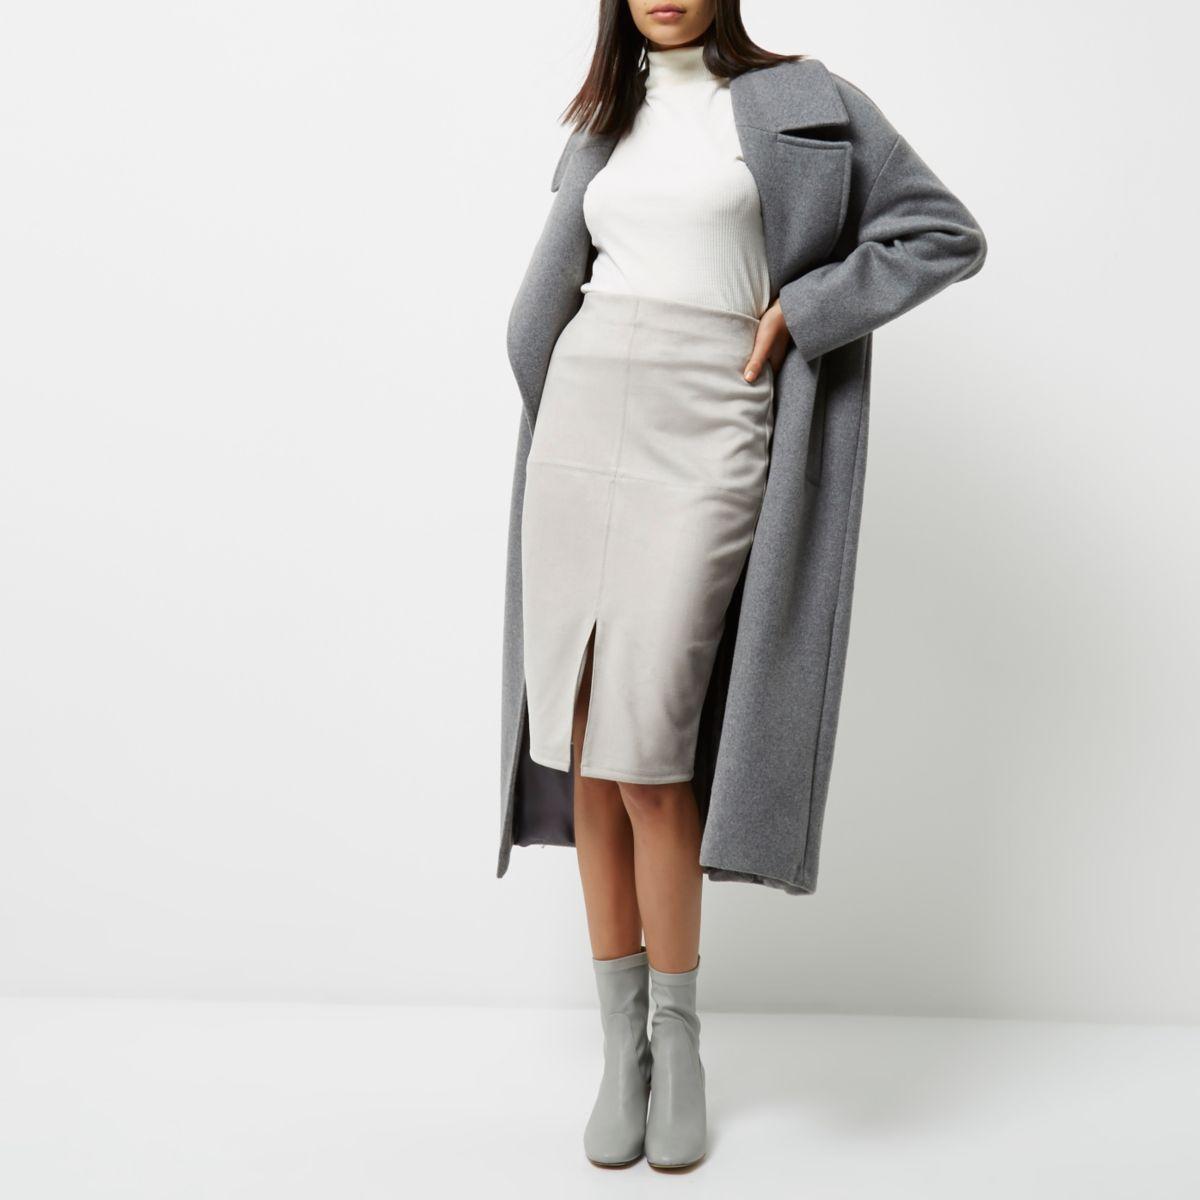 Light grey faux suede pencil skirt